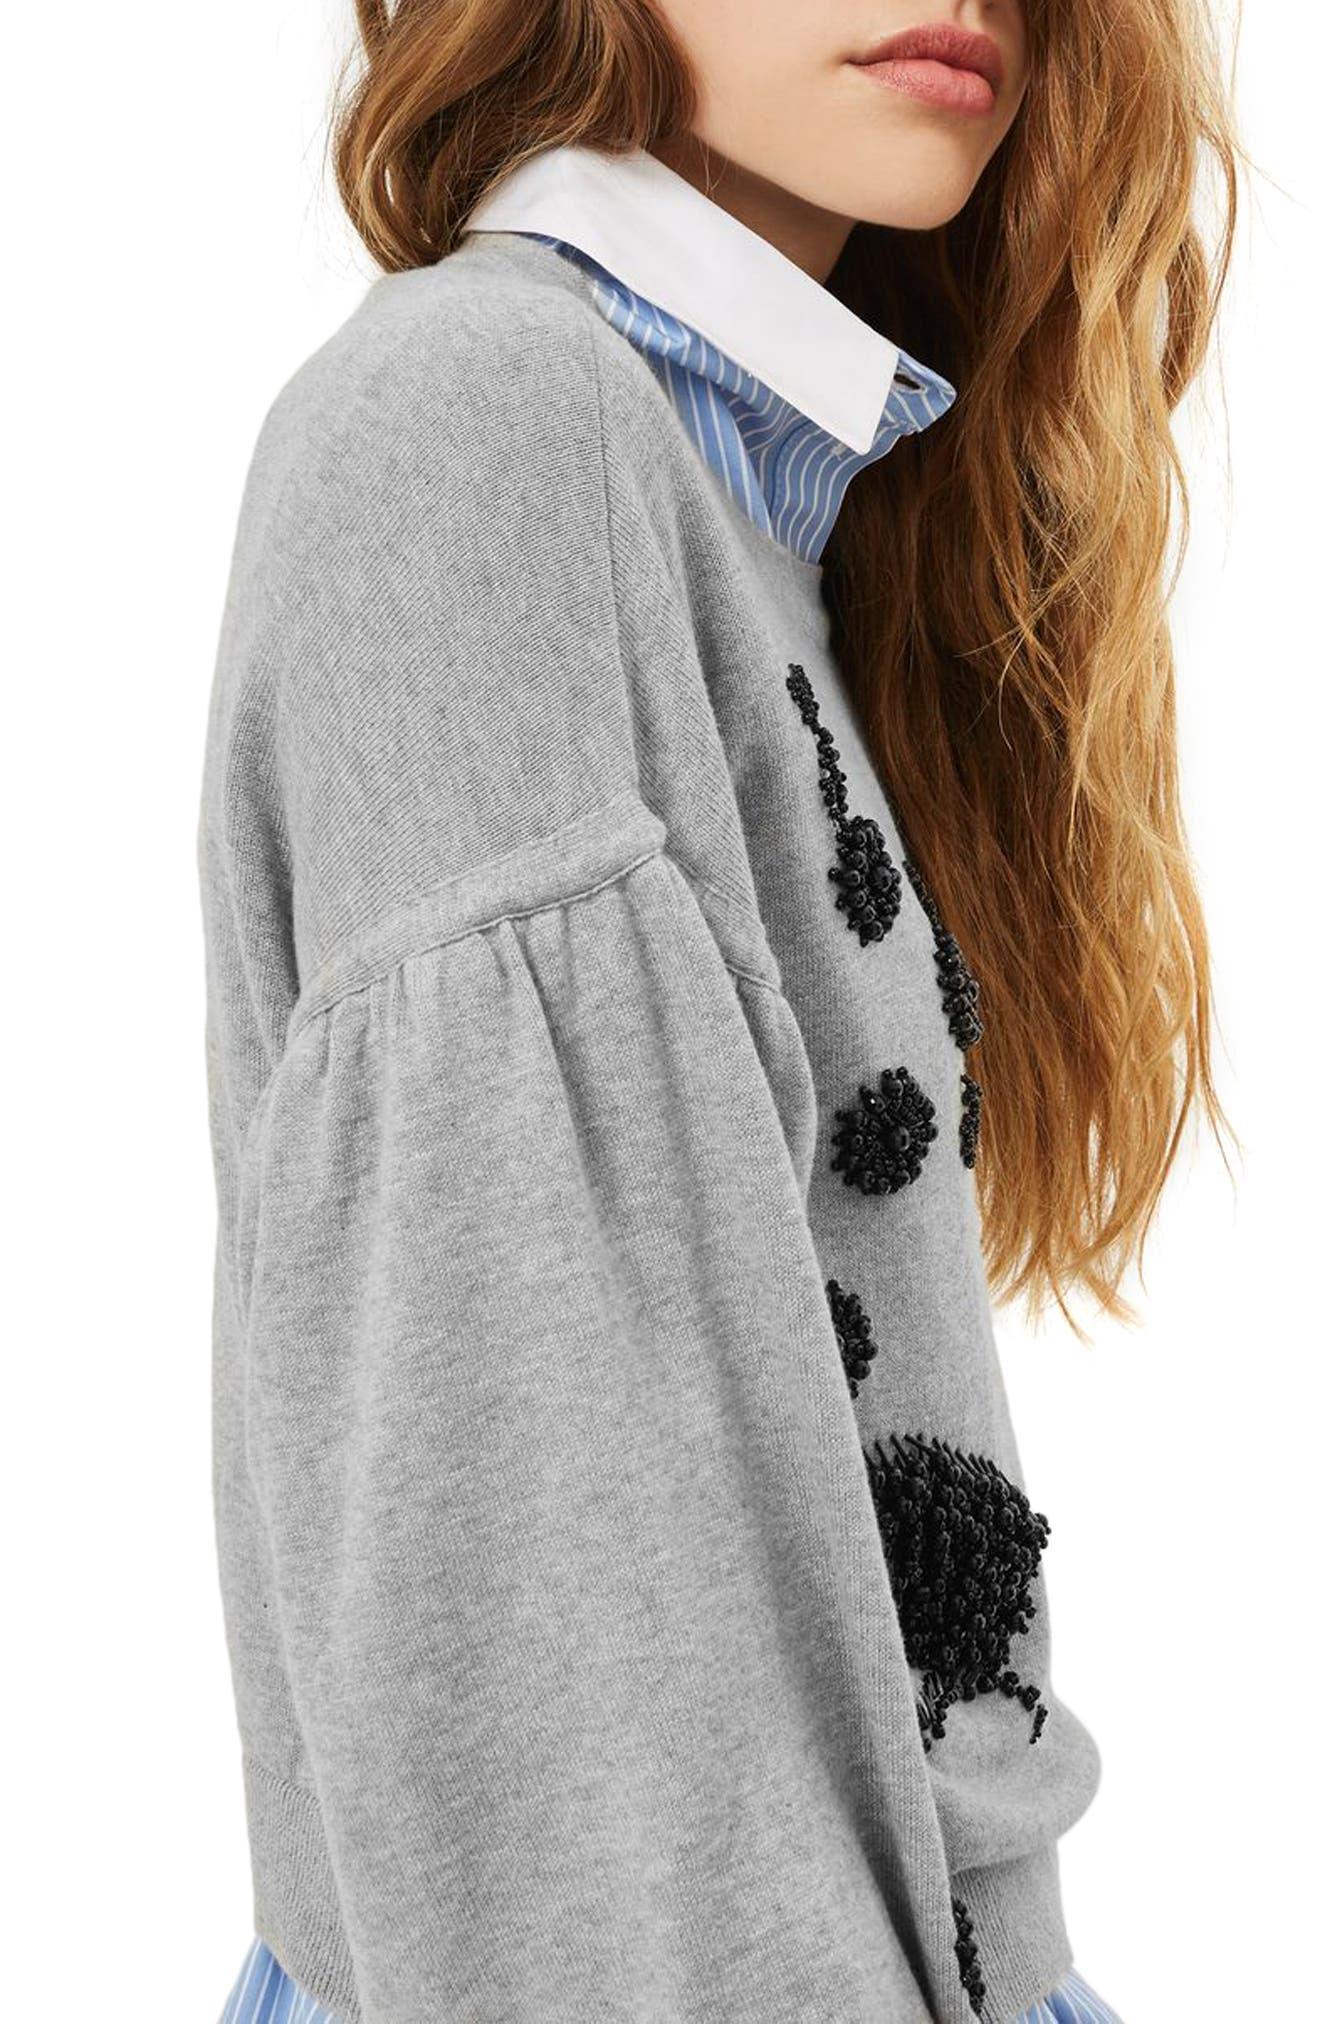 Beaded Balloon Sleeve Sweater,                             Alternate thumbnail 4, color,                             Grey Marl Multi